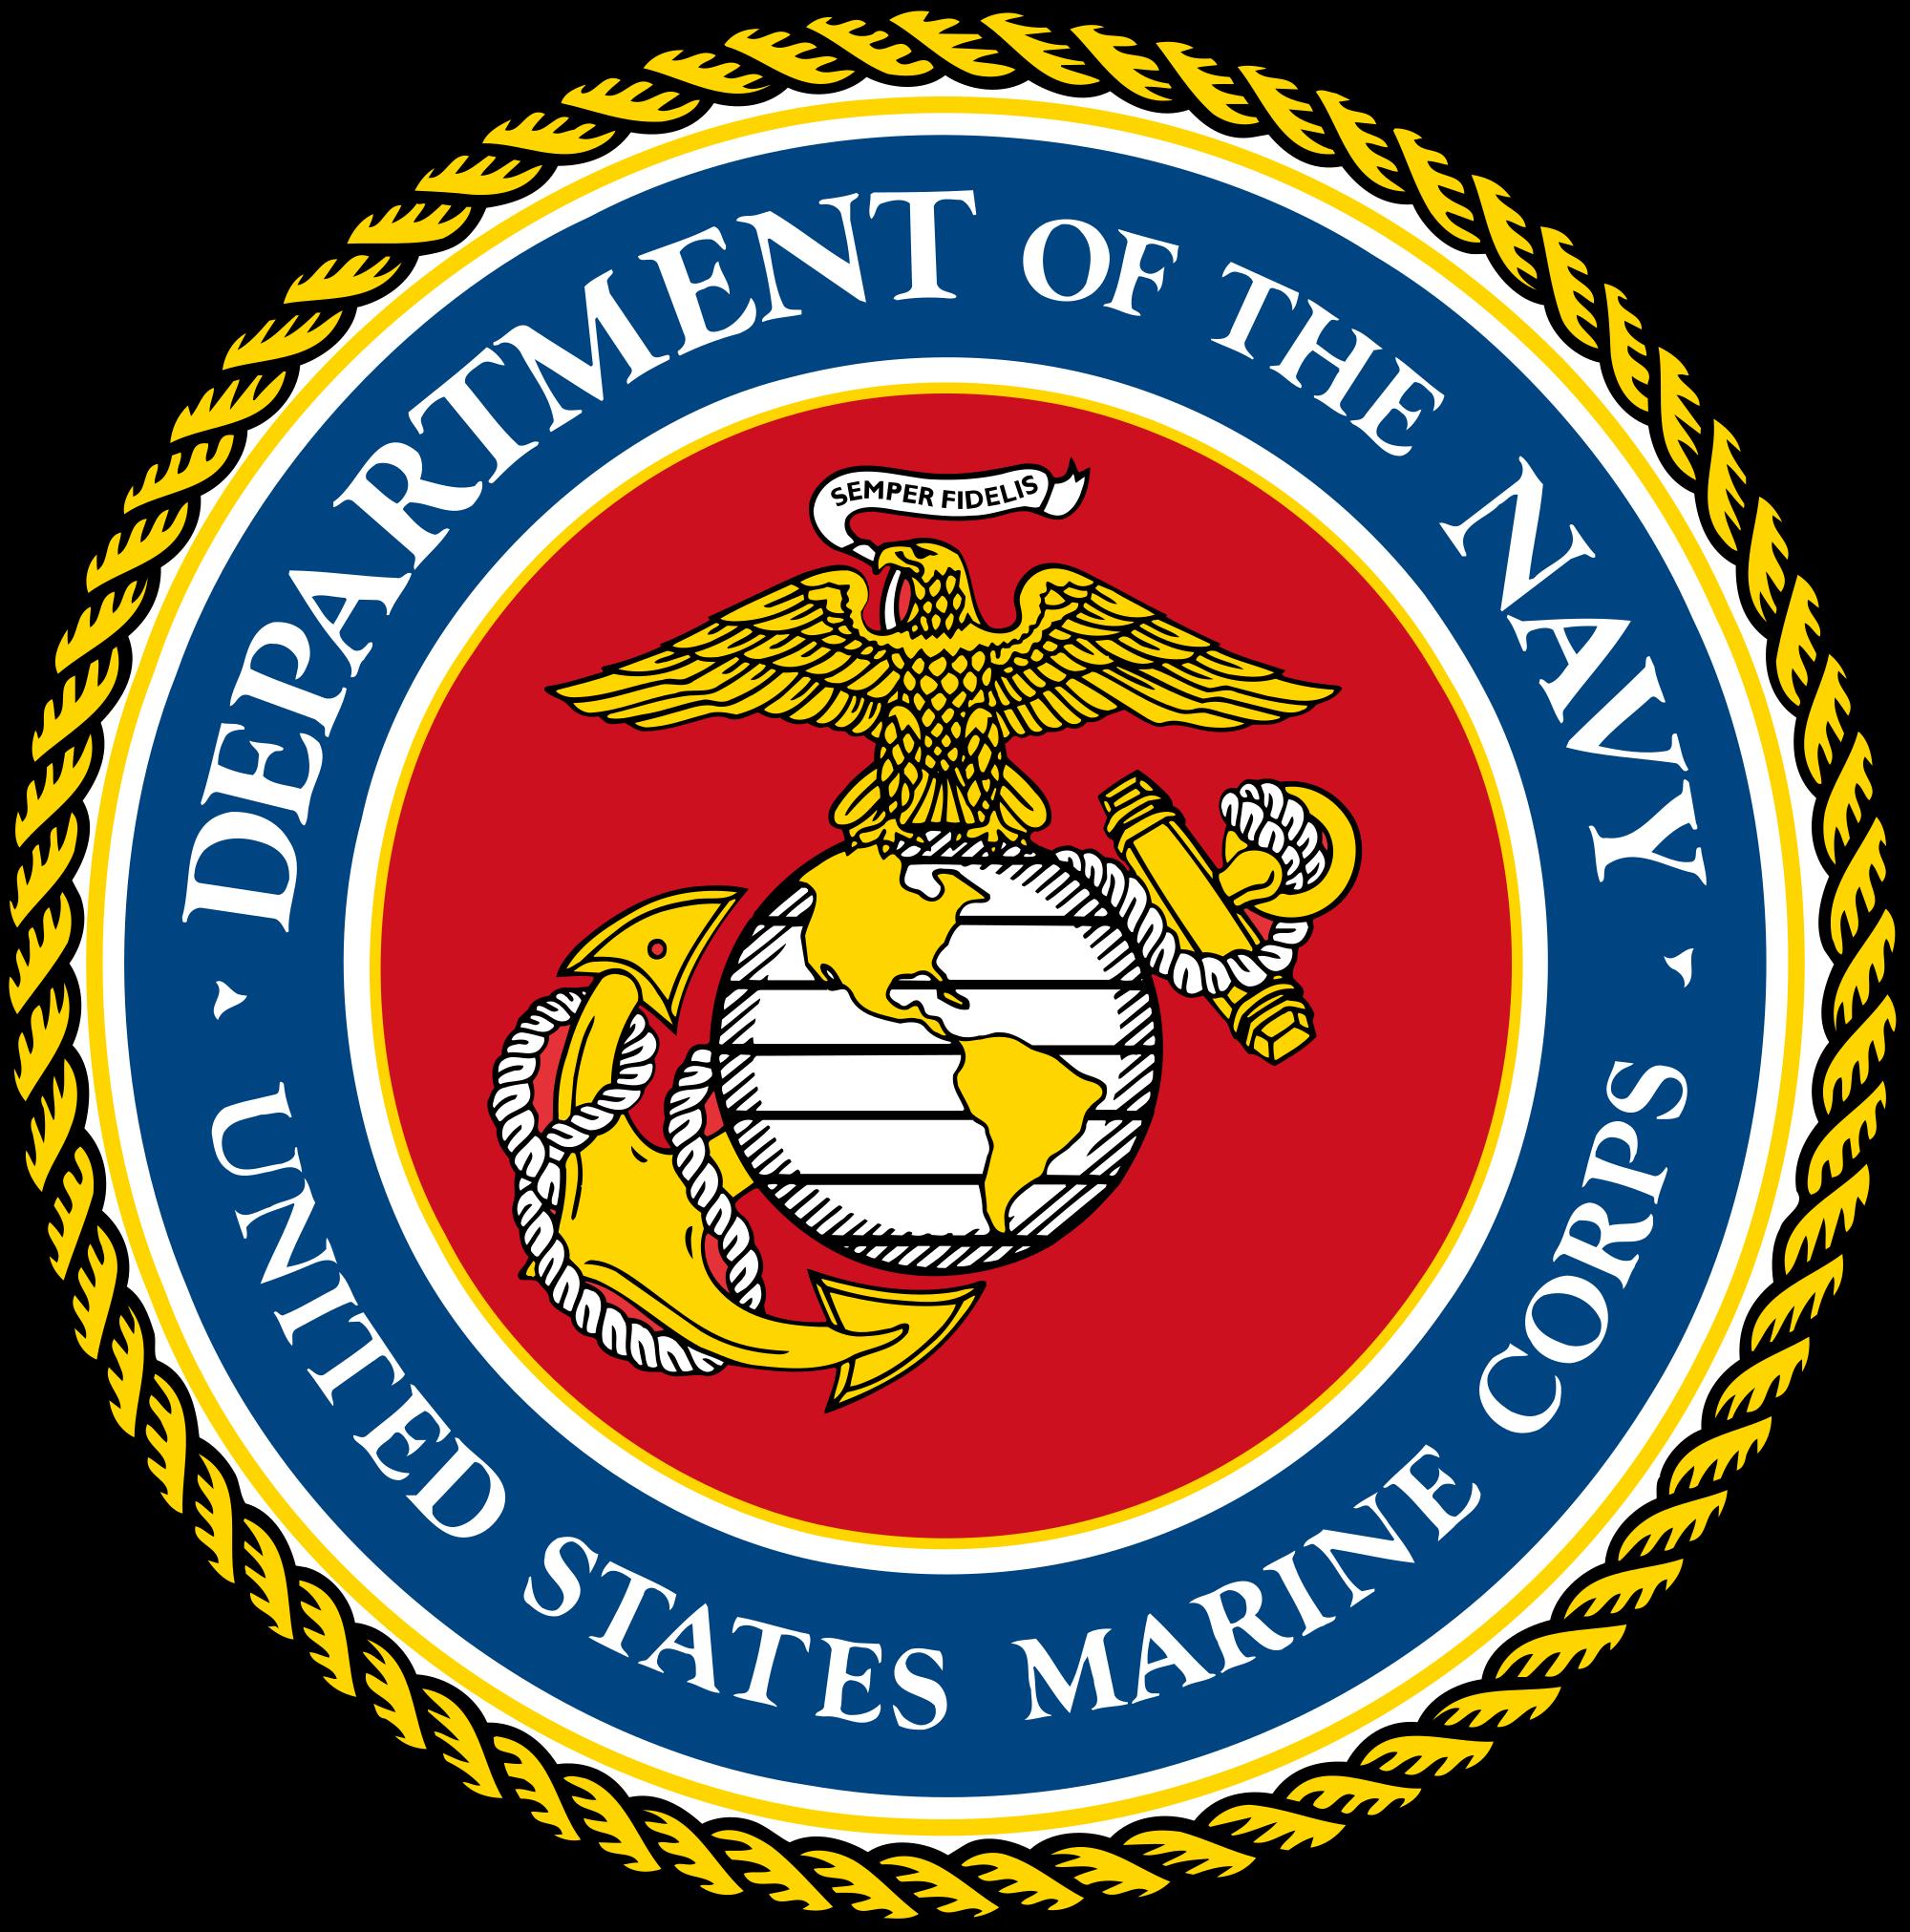 Us Marines Logo Vector At Getdrawings Com Free For